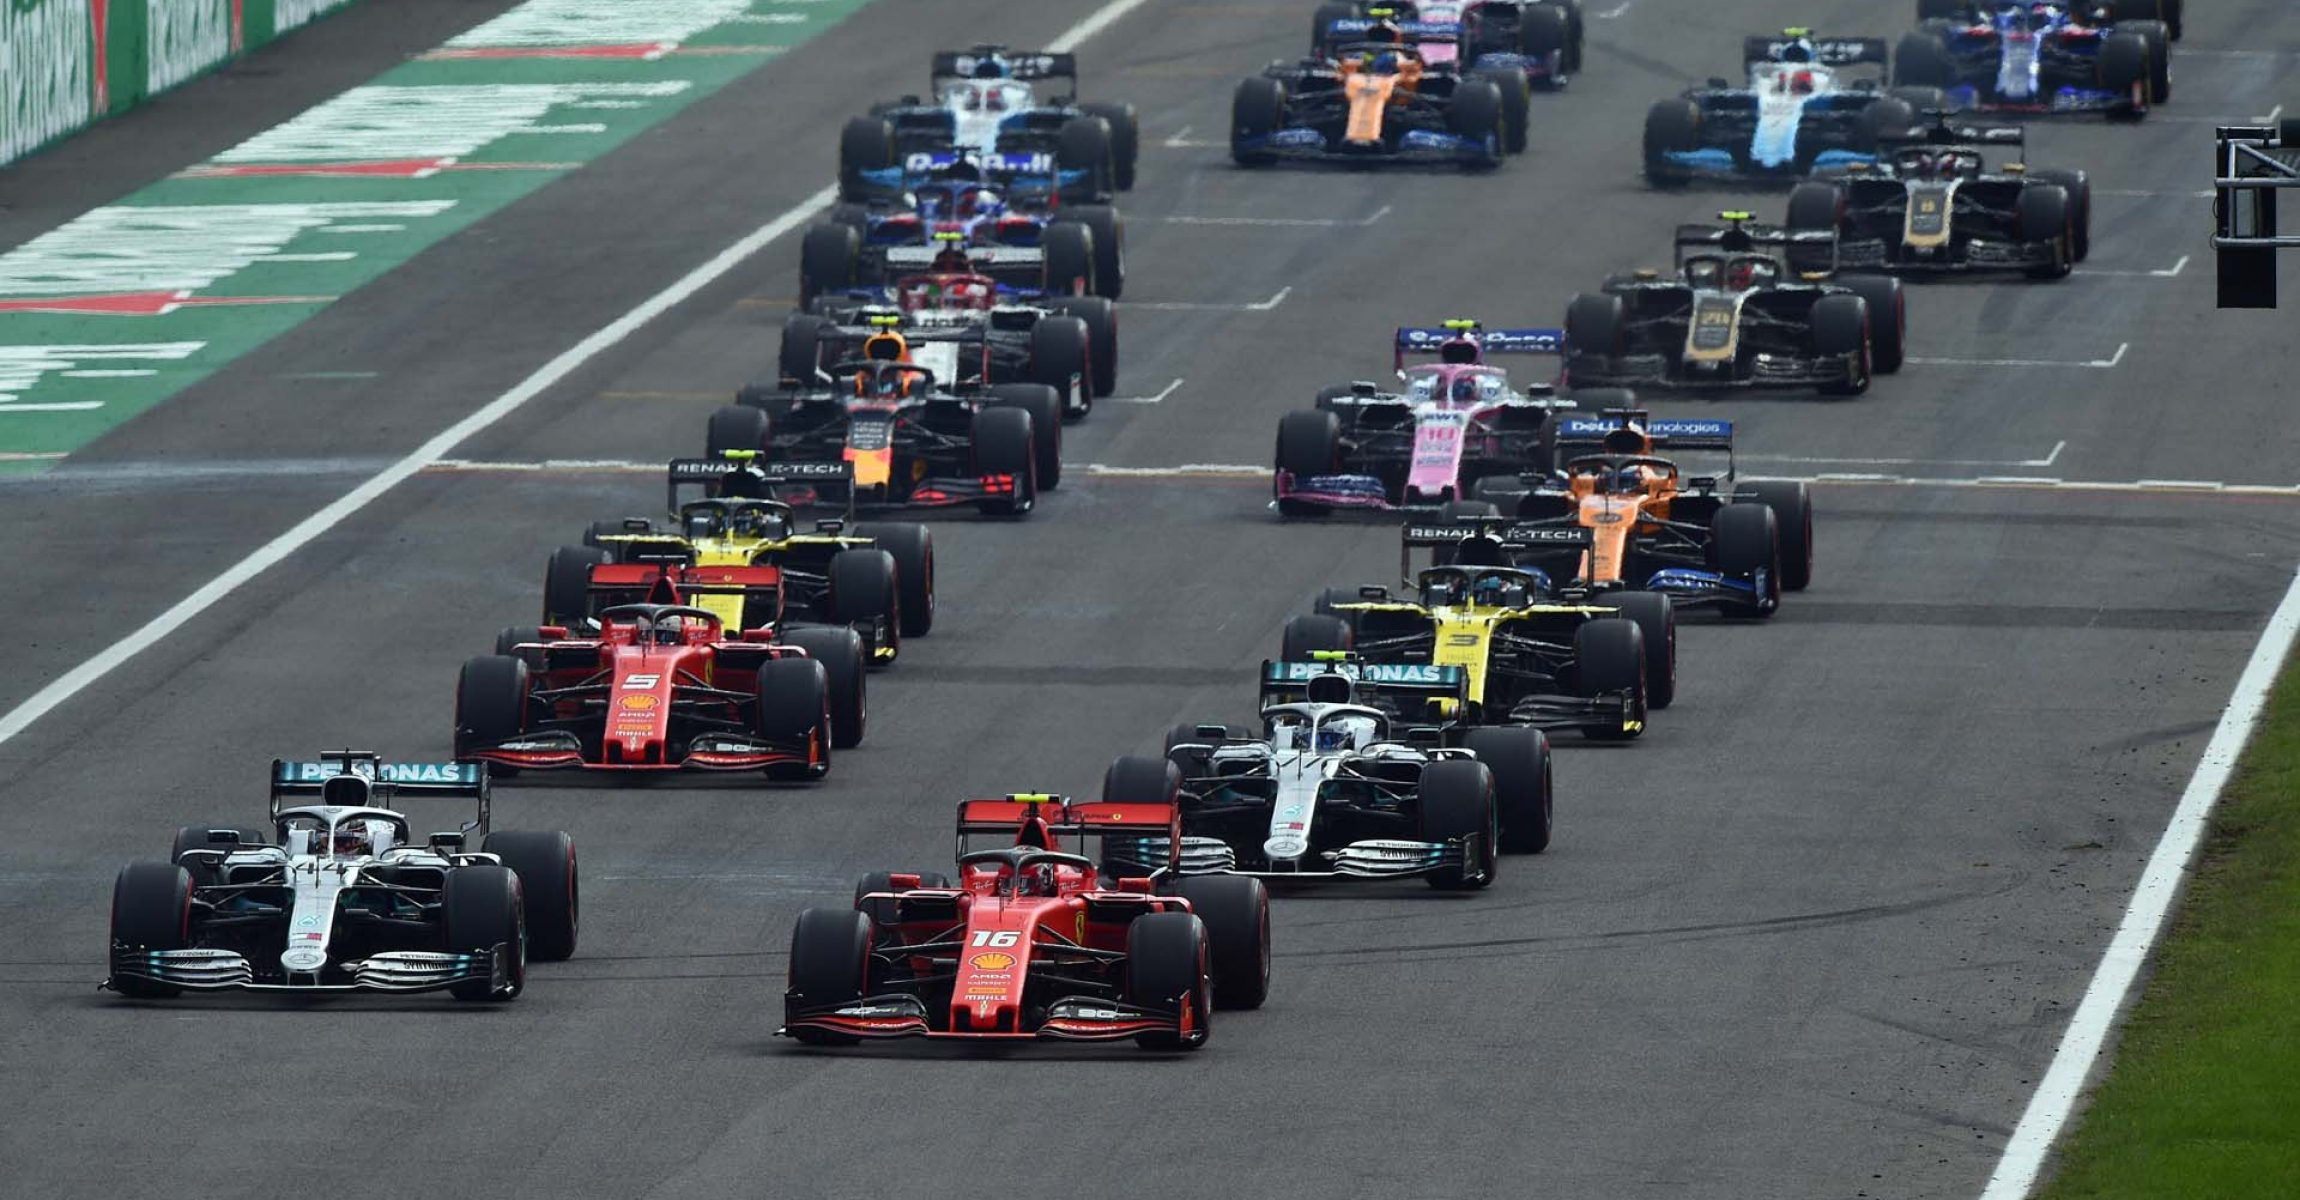 Italian Grand Prix, Start, Monza, 2019